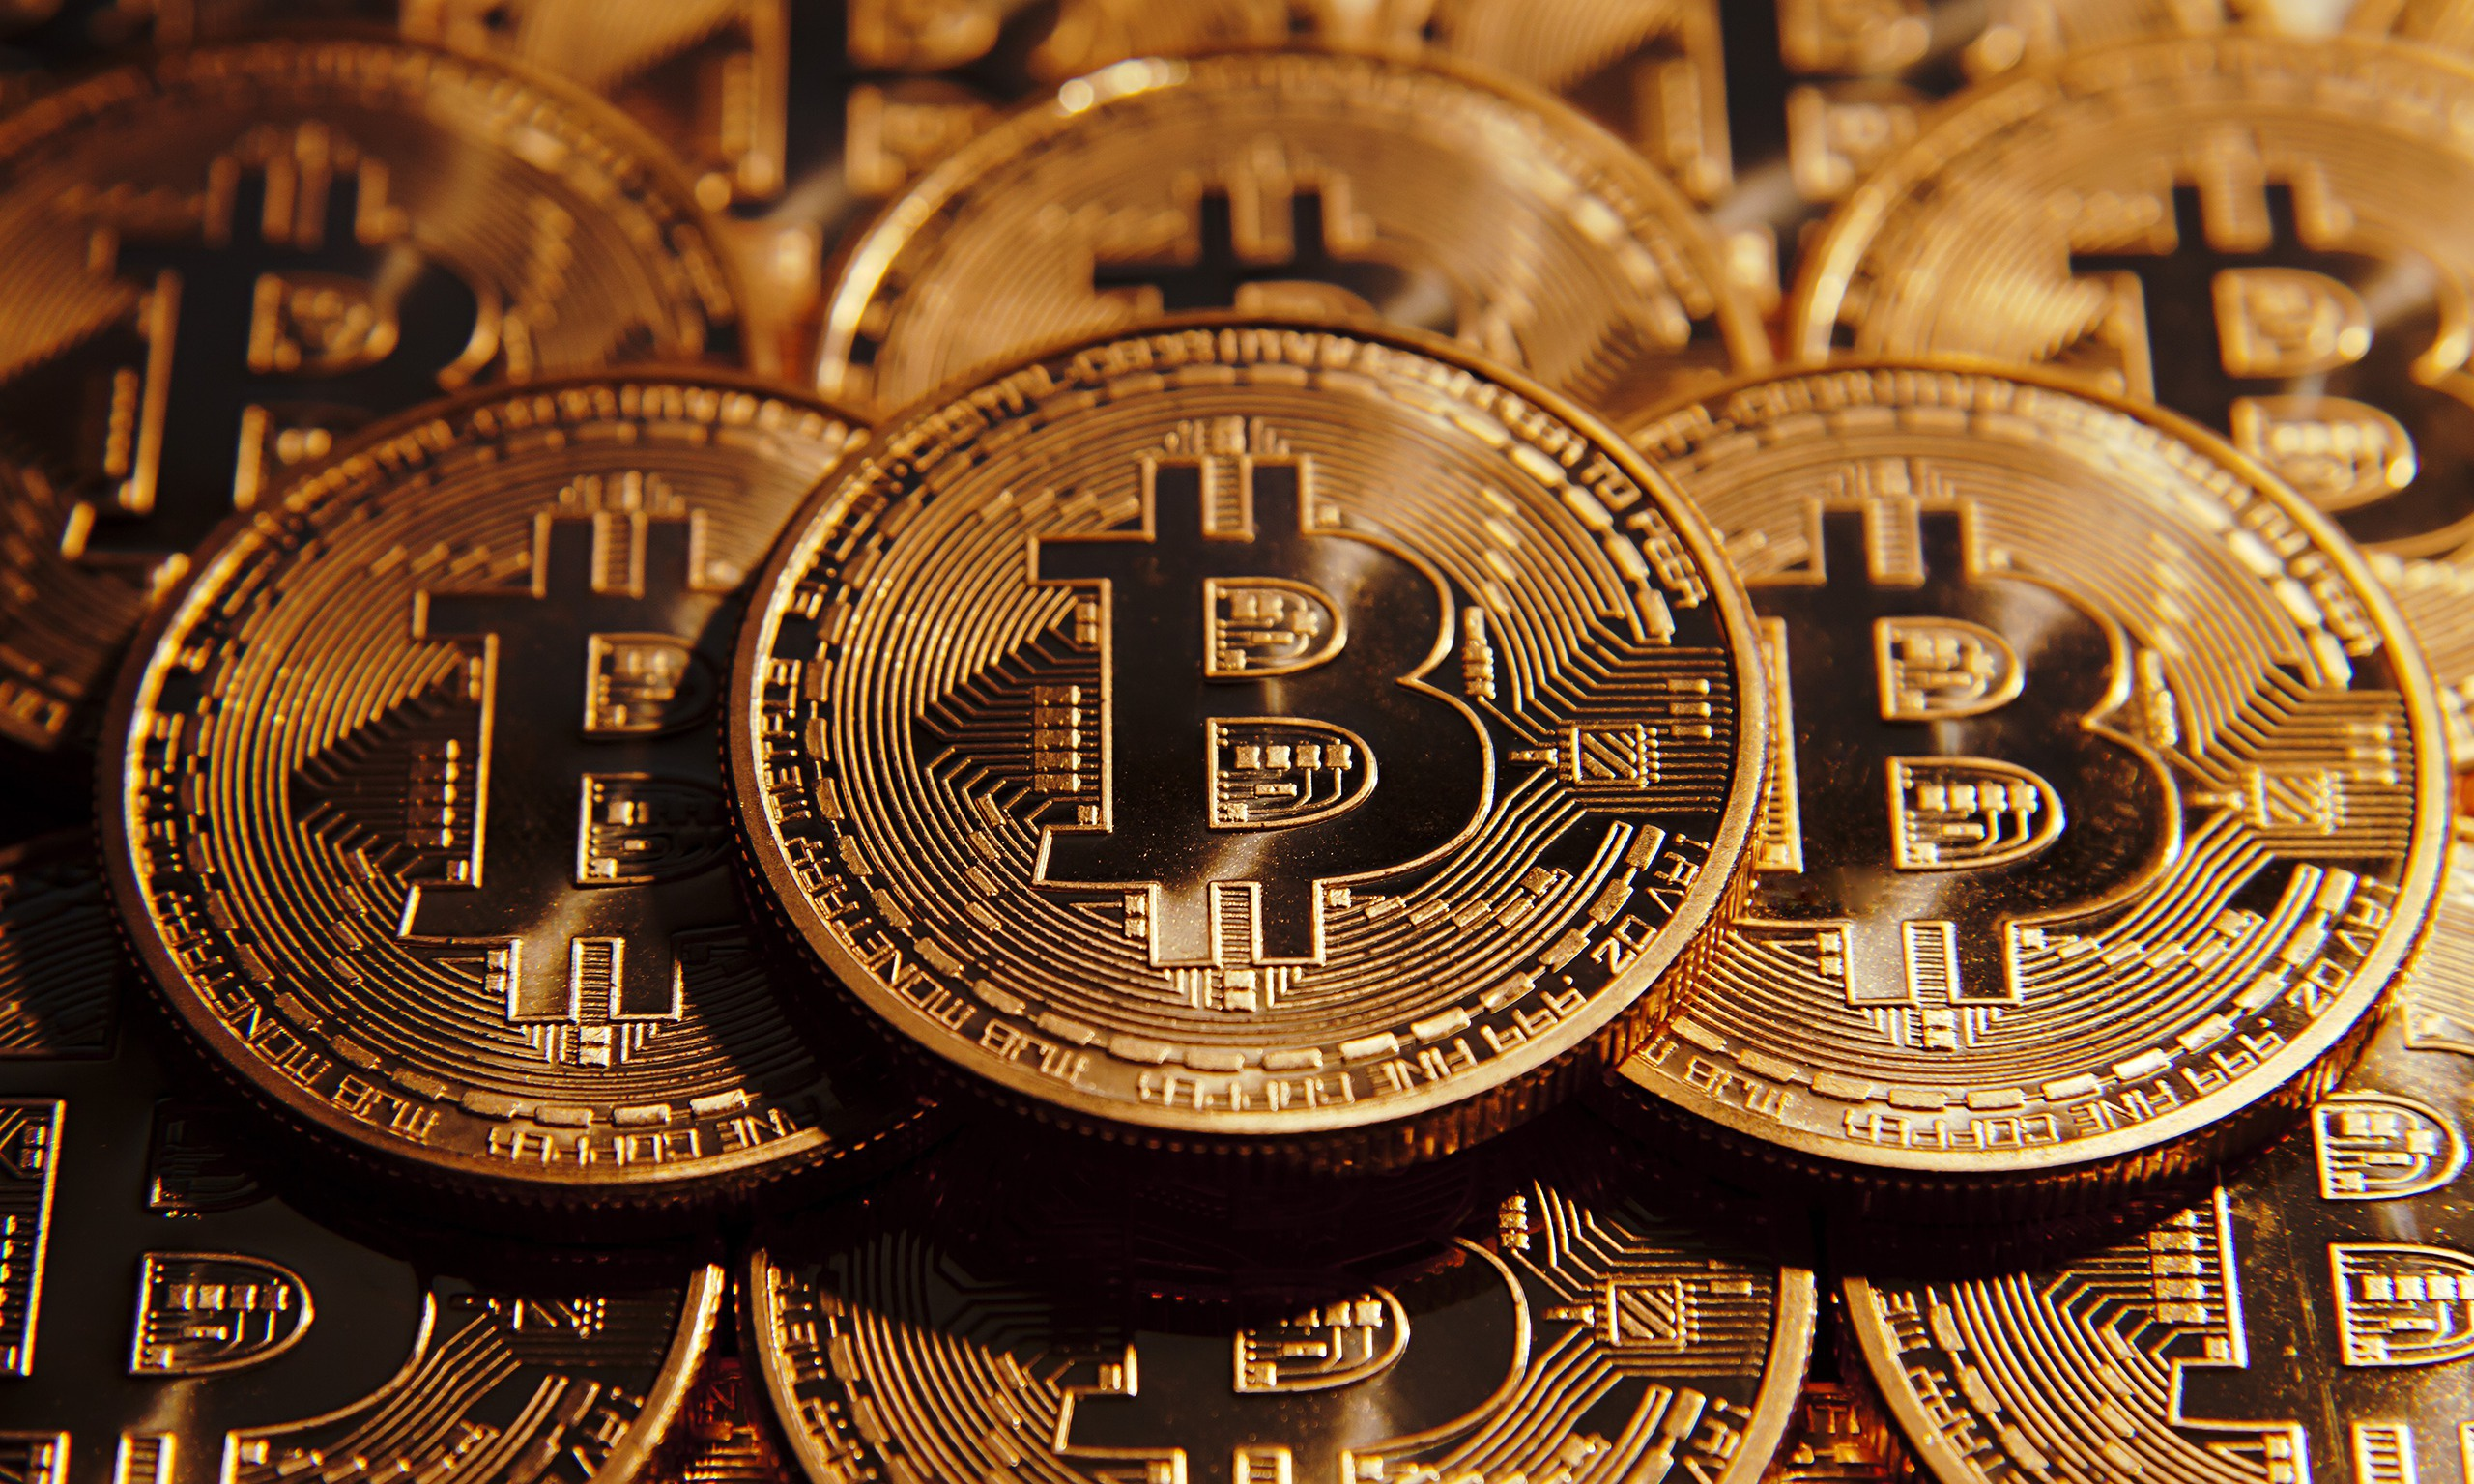 Bitcoin surges past $50,000